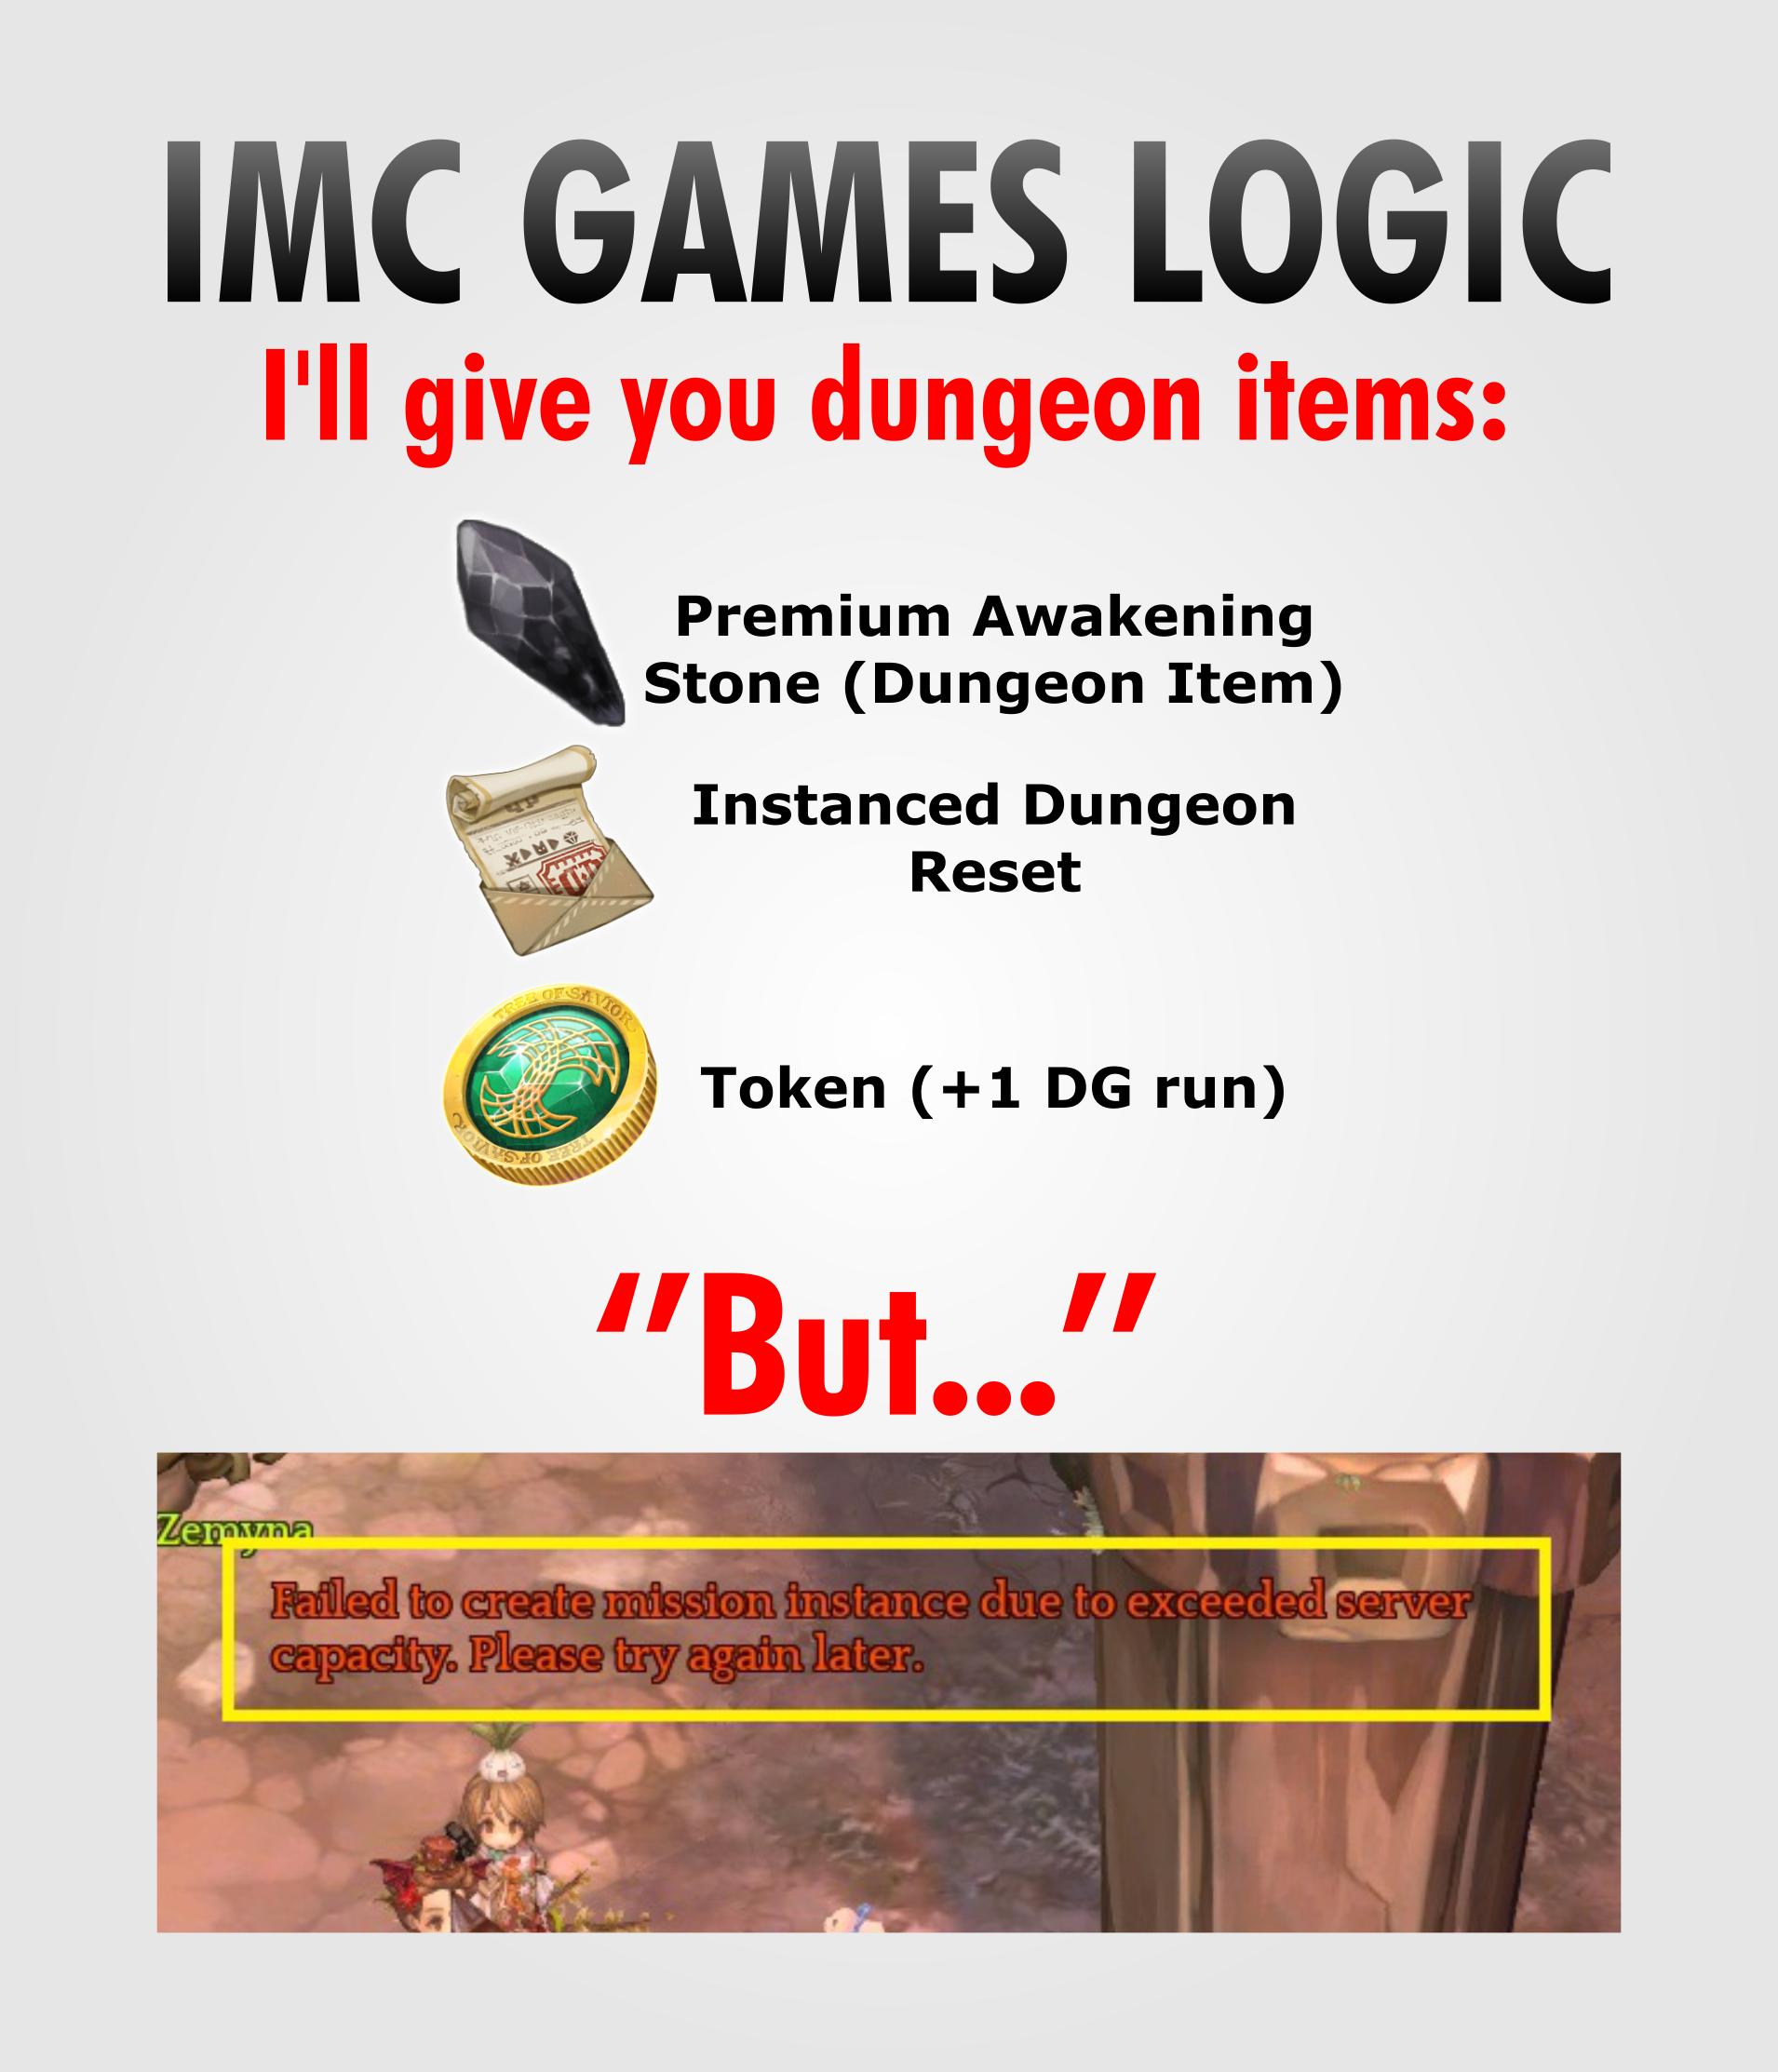 IMC Games Logic - General Discussion - Tree of Savior